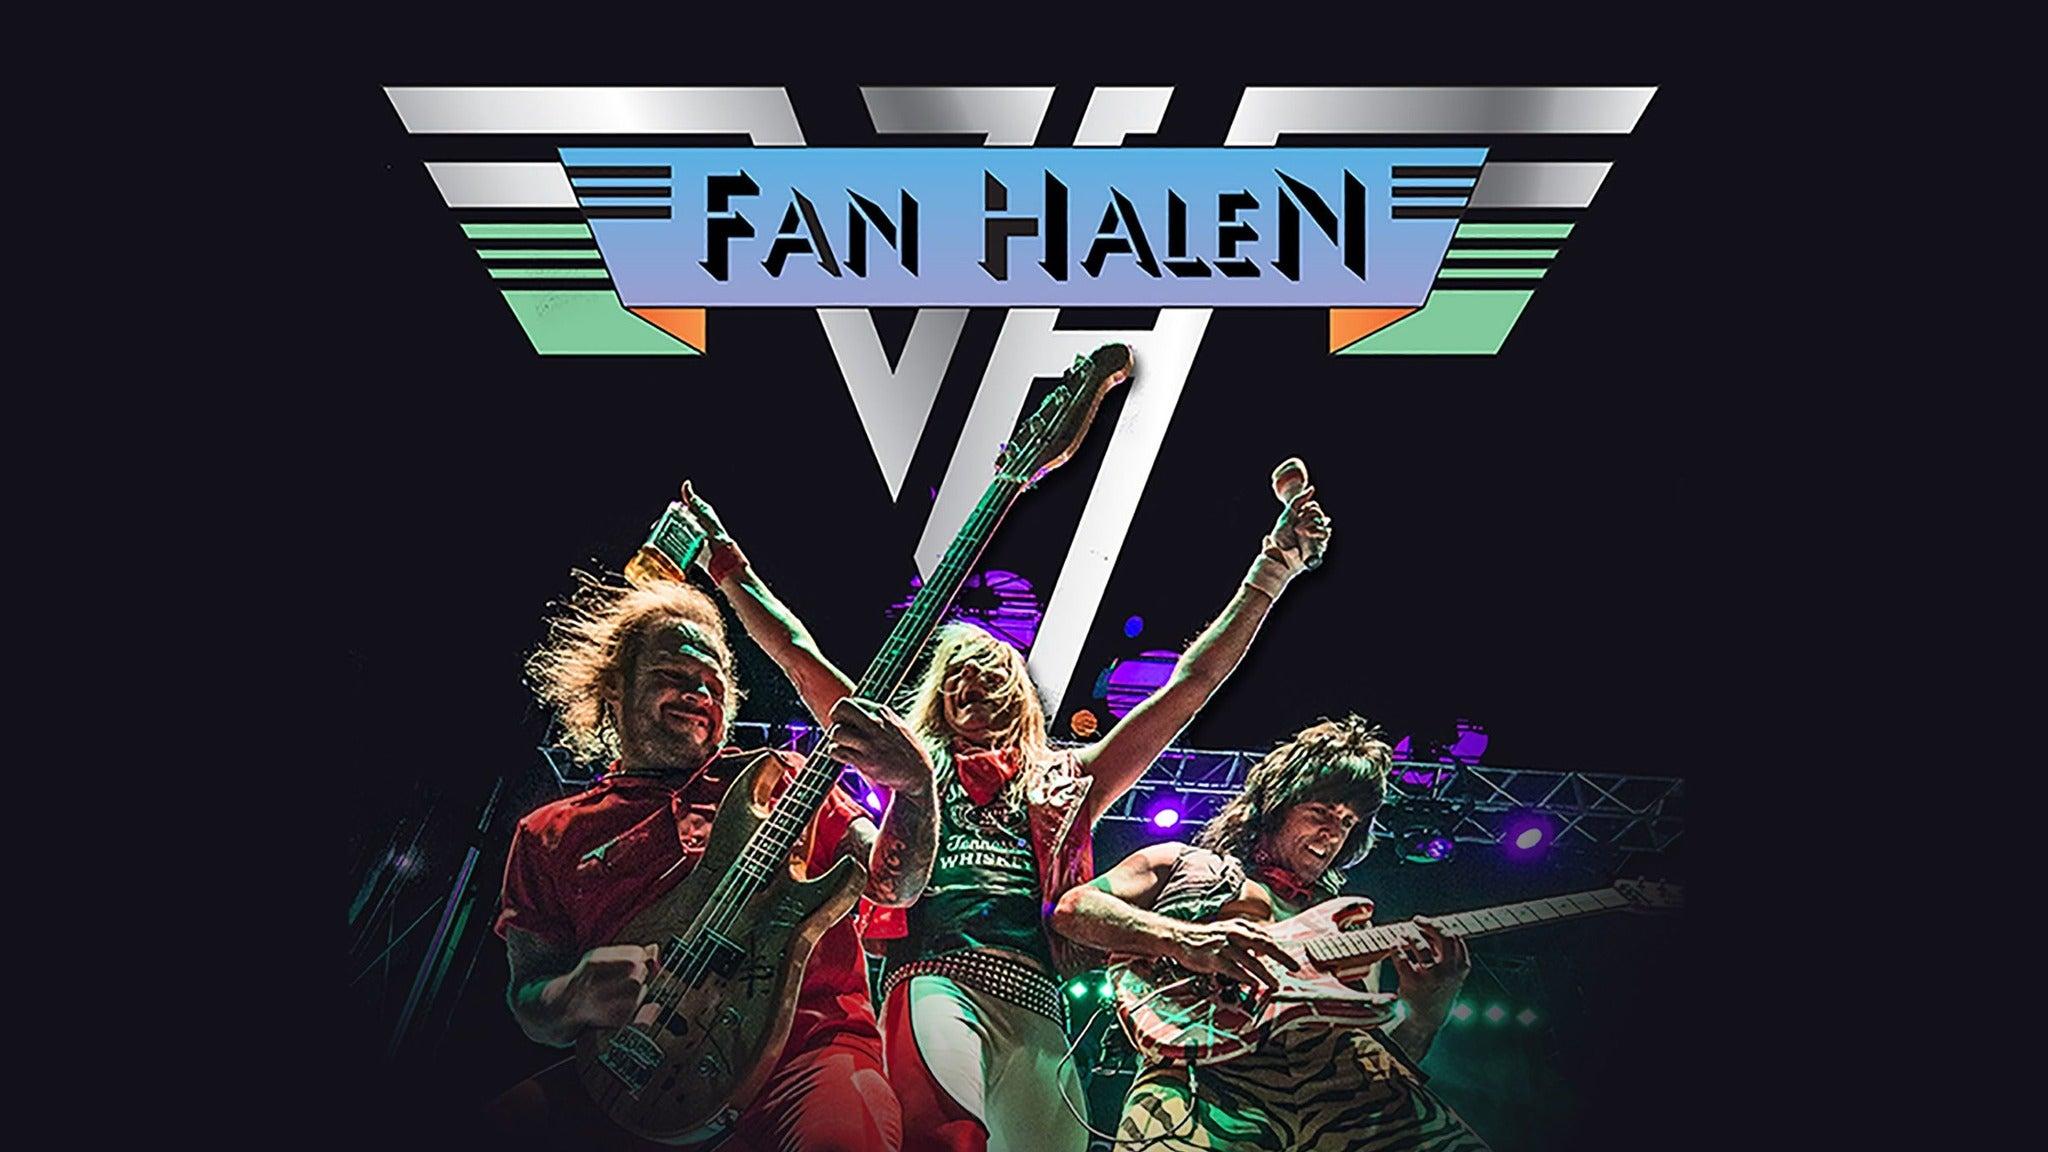 Van Halen Tribute by Fan Halen at The Canyon Agoura Hills